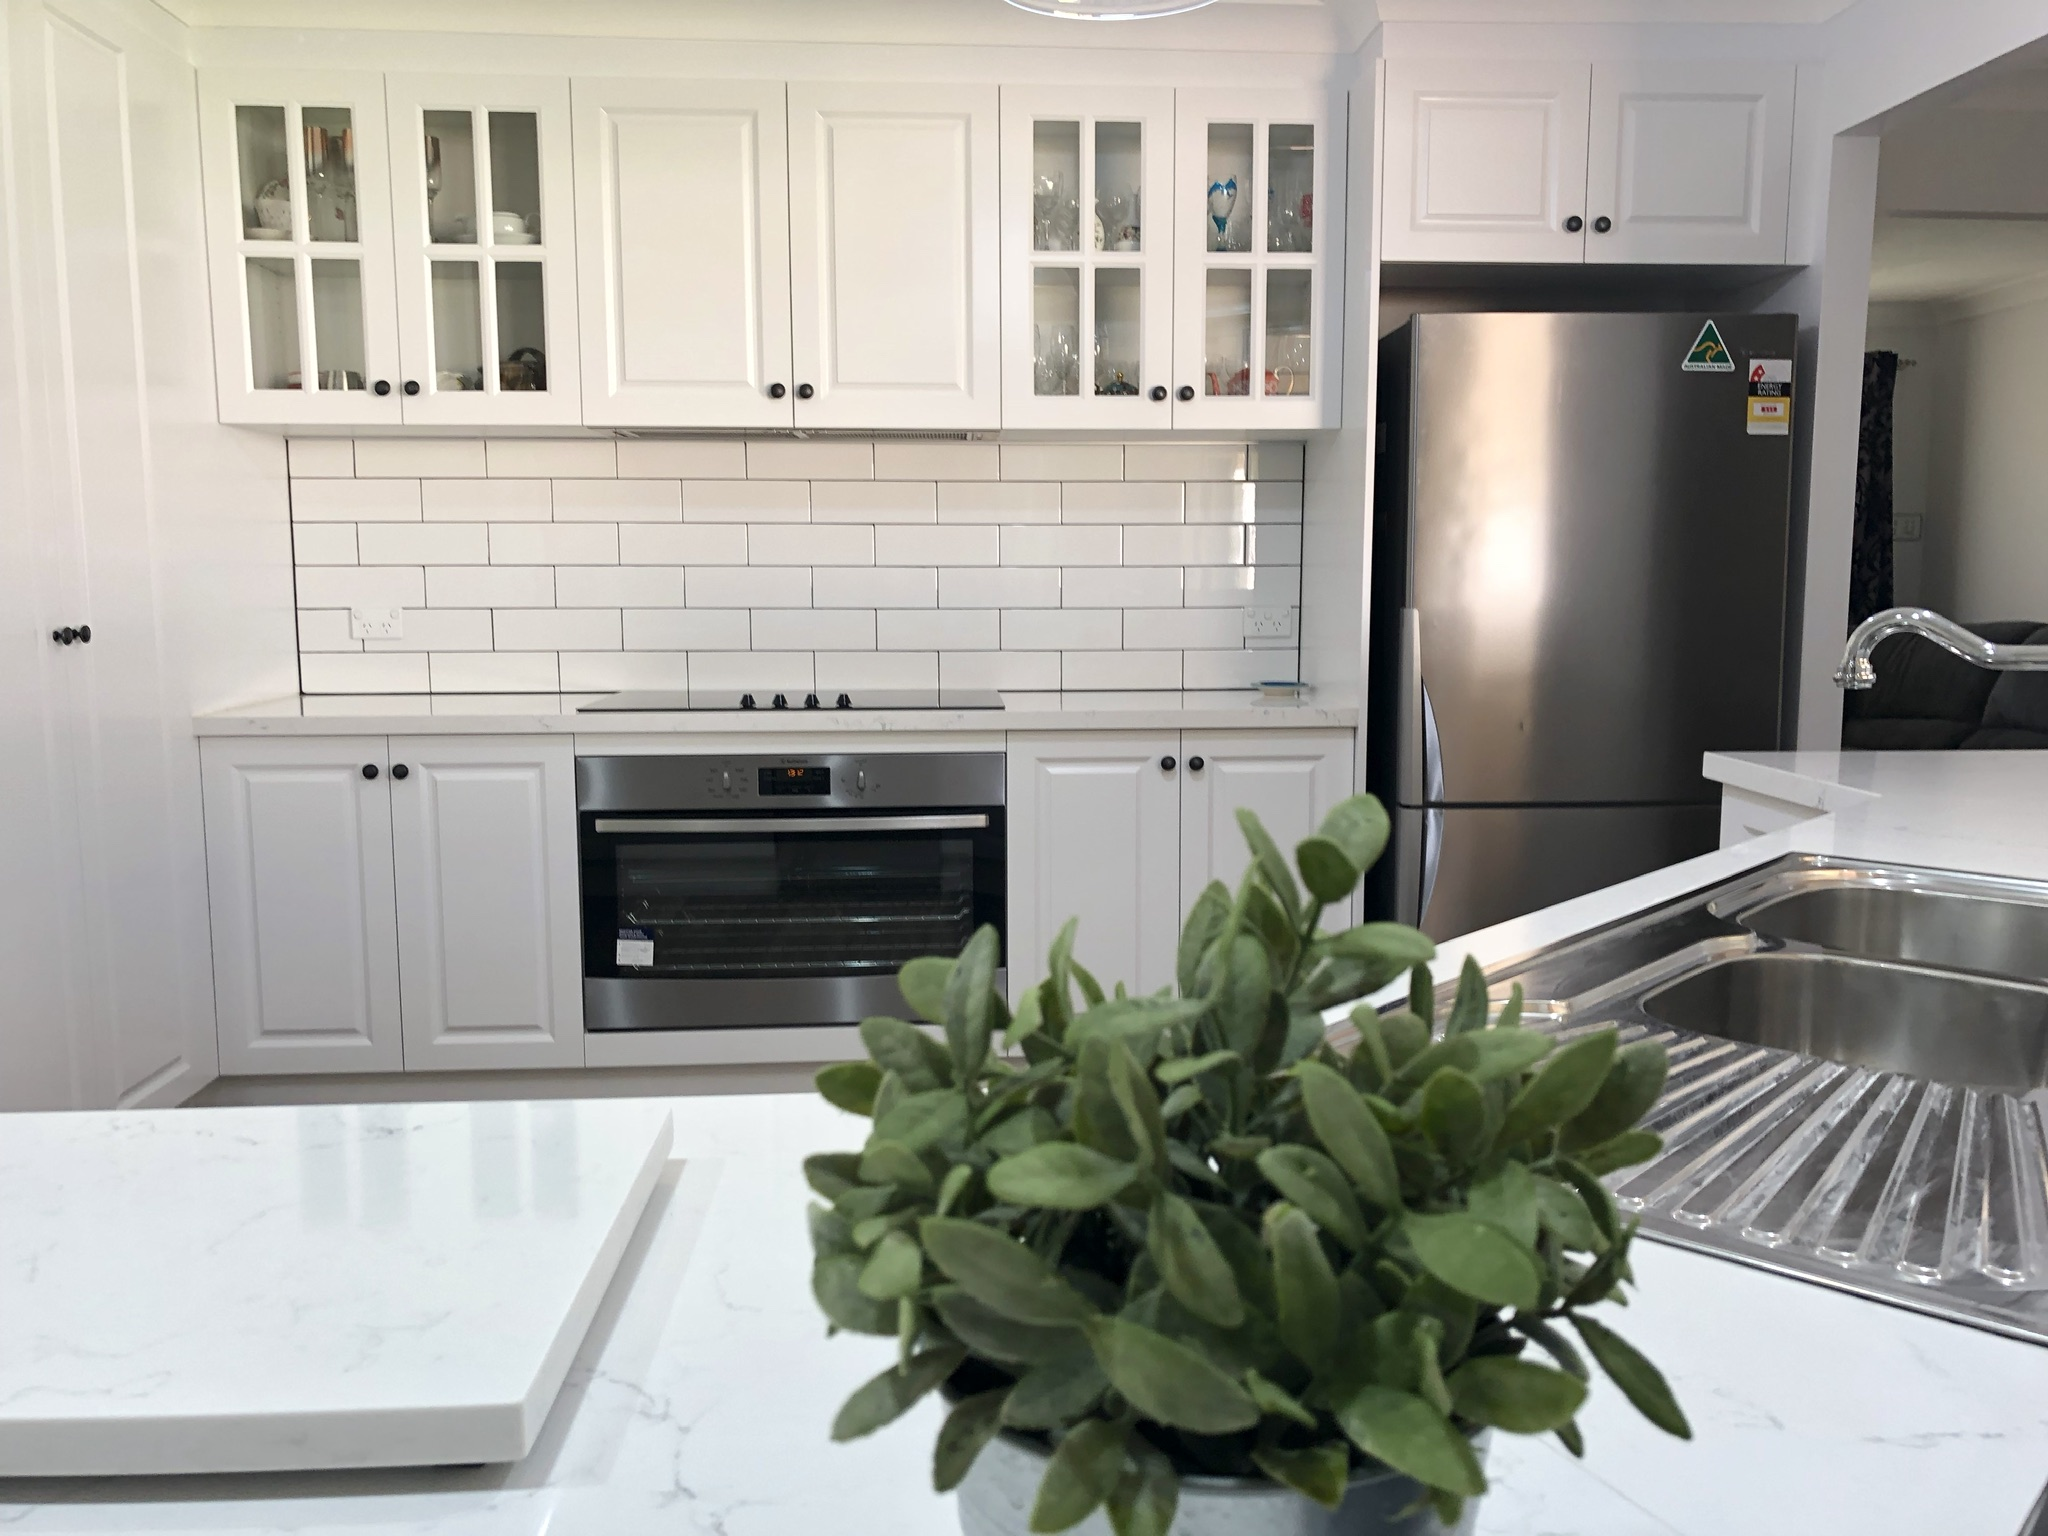 Stunning Hamptons style kitchen - kitchen renovation by Master Bathrooms & Kitchens